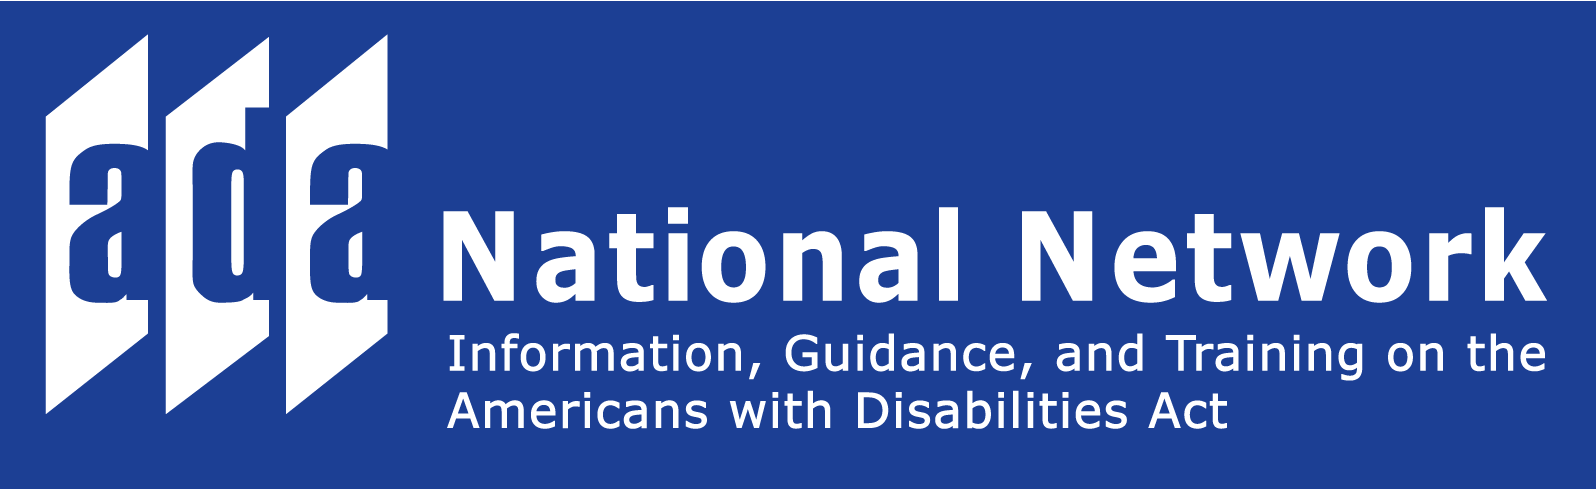 ADA National Network logo